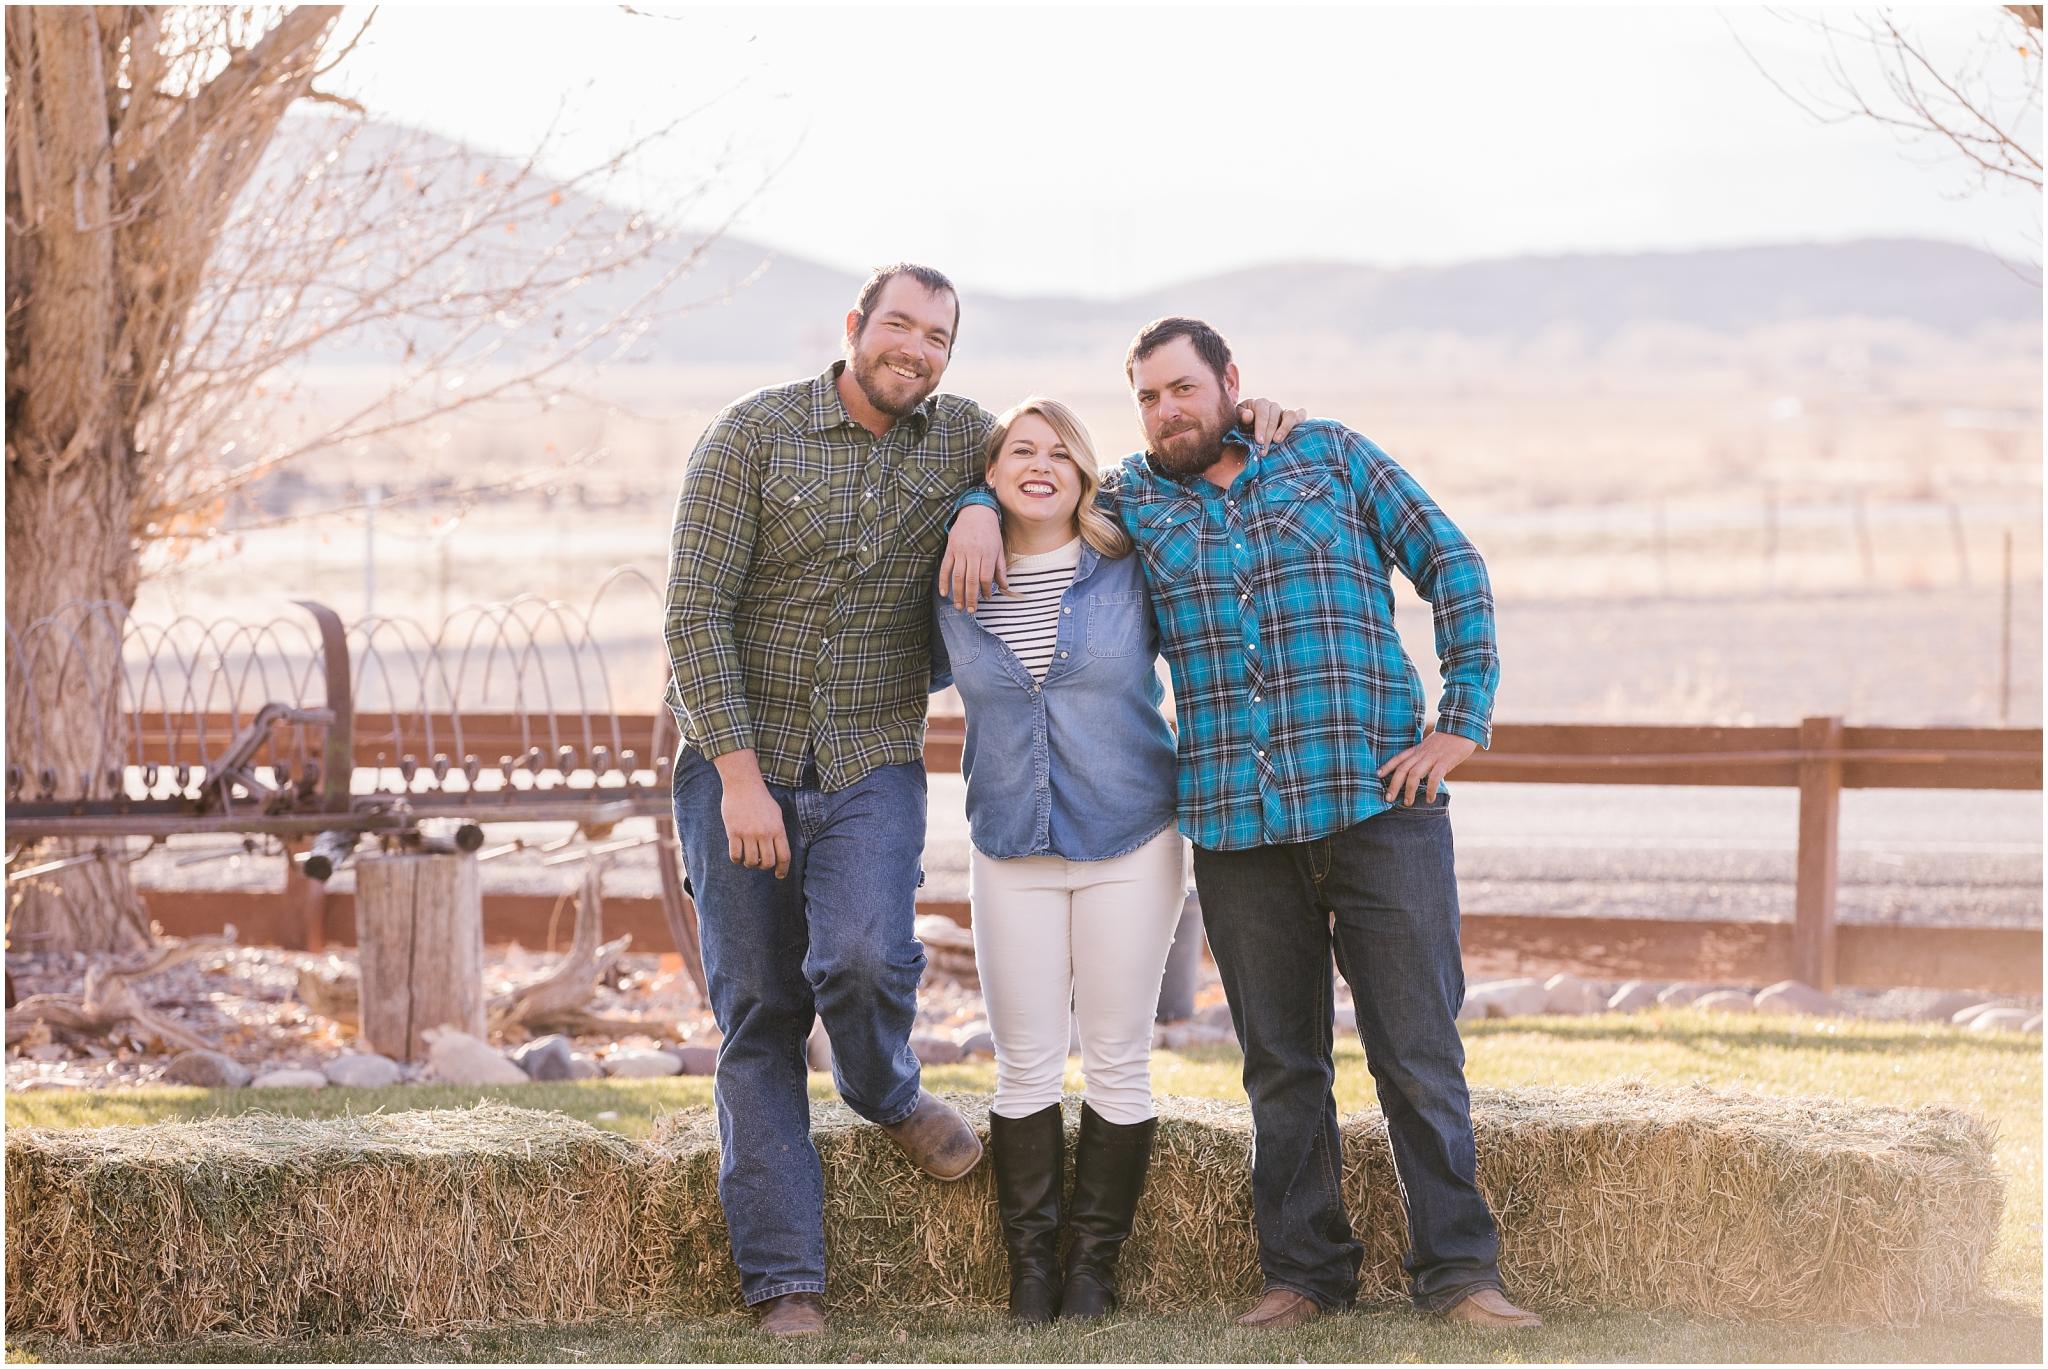 Conrad-39_Lizzie-B-Imagery-Utah-Family-Photographer-Utah-County-Central-Utah-Park-City-Extended-Family-Session.jpg